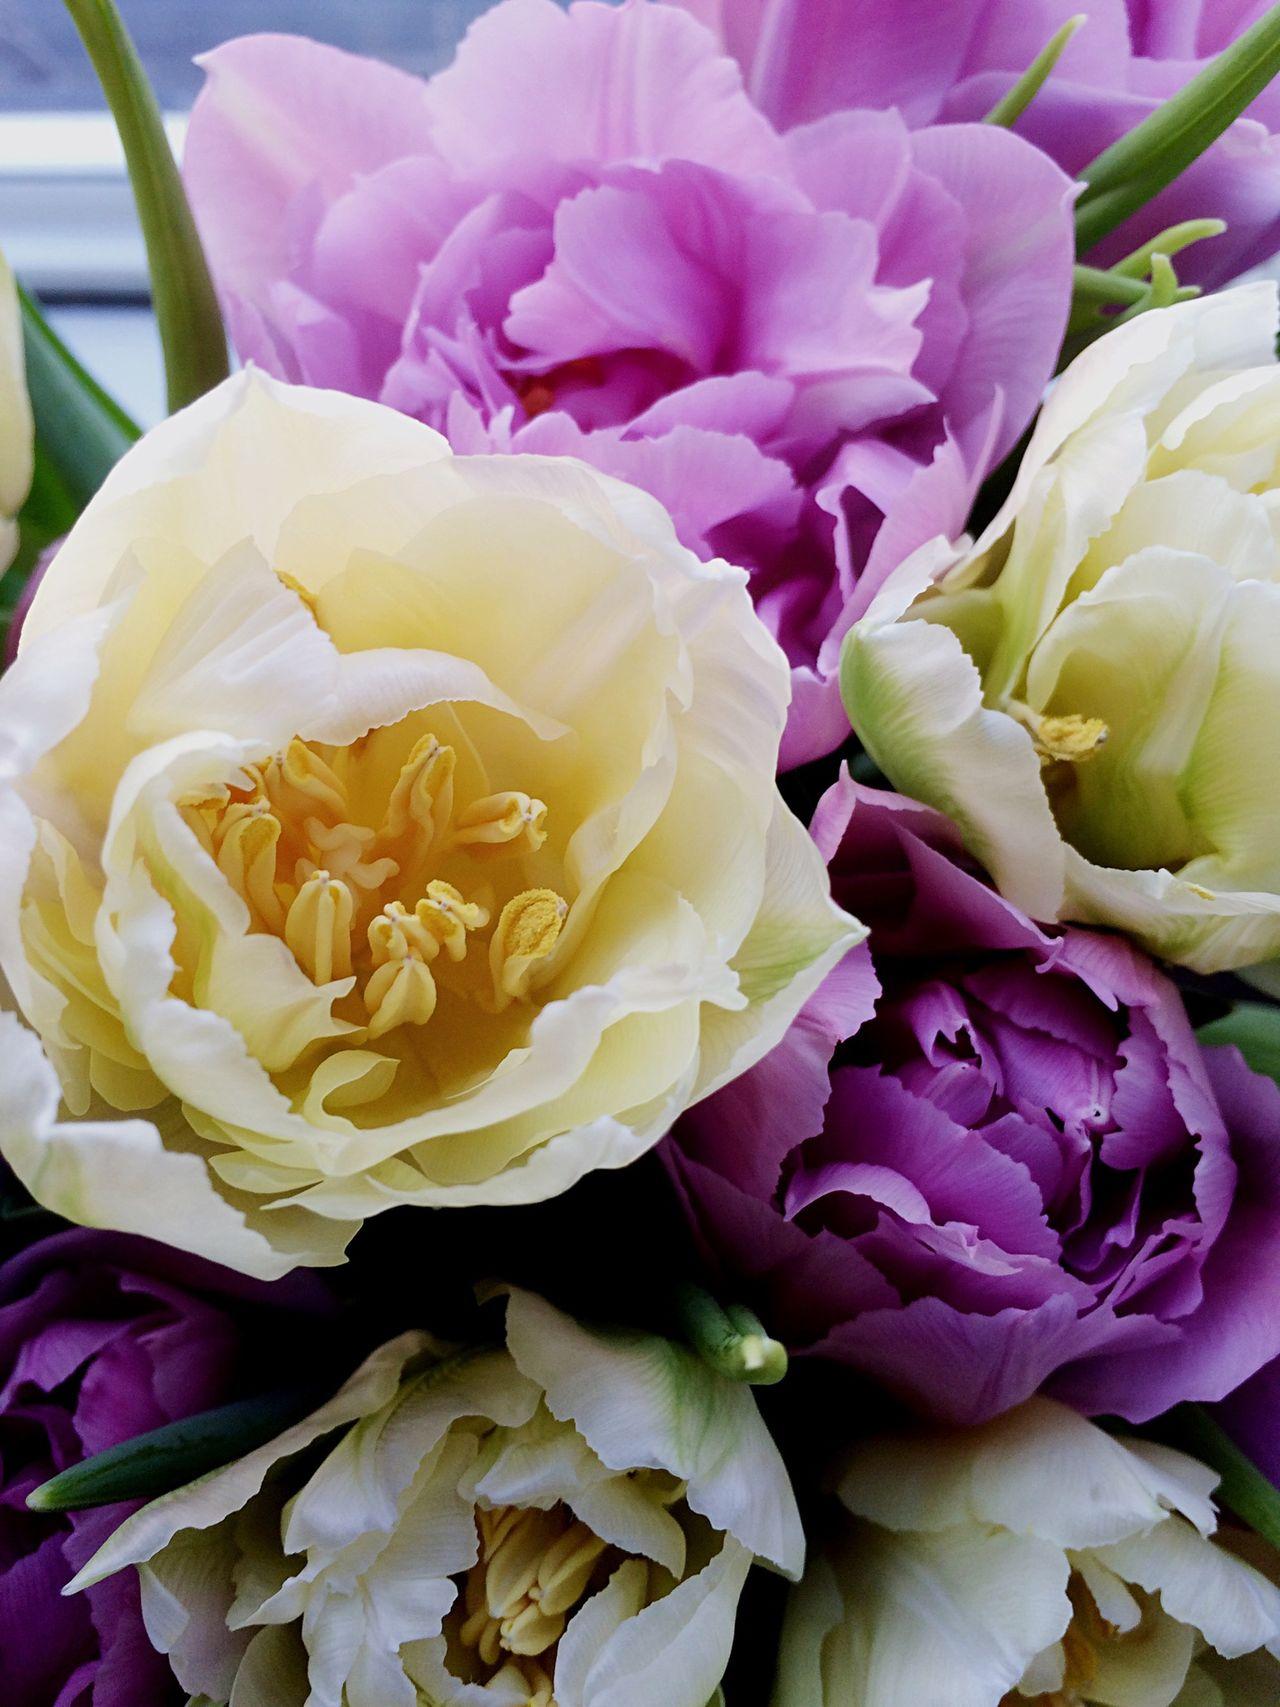 Tulips Flowerporn Flowerphoto Flowerstagram Flowerhead Flower Collection Flowers, Nature And Beauty Flowers_collection EyeEm Gallery EyeEm Flower Floweroftheday